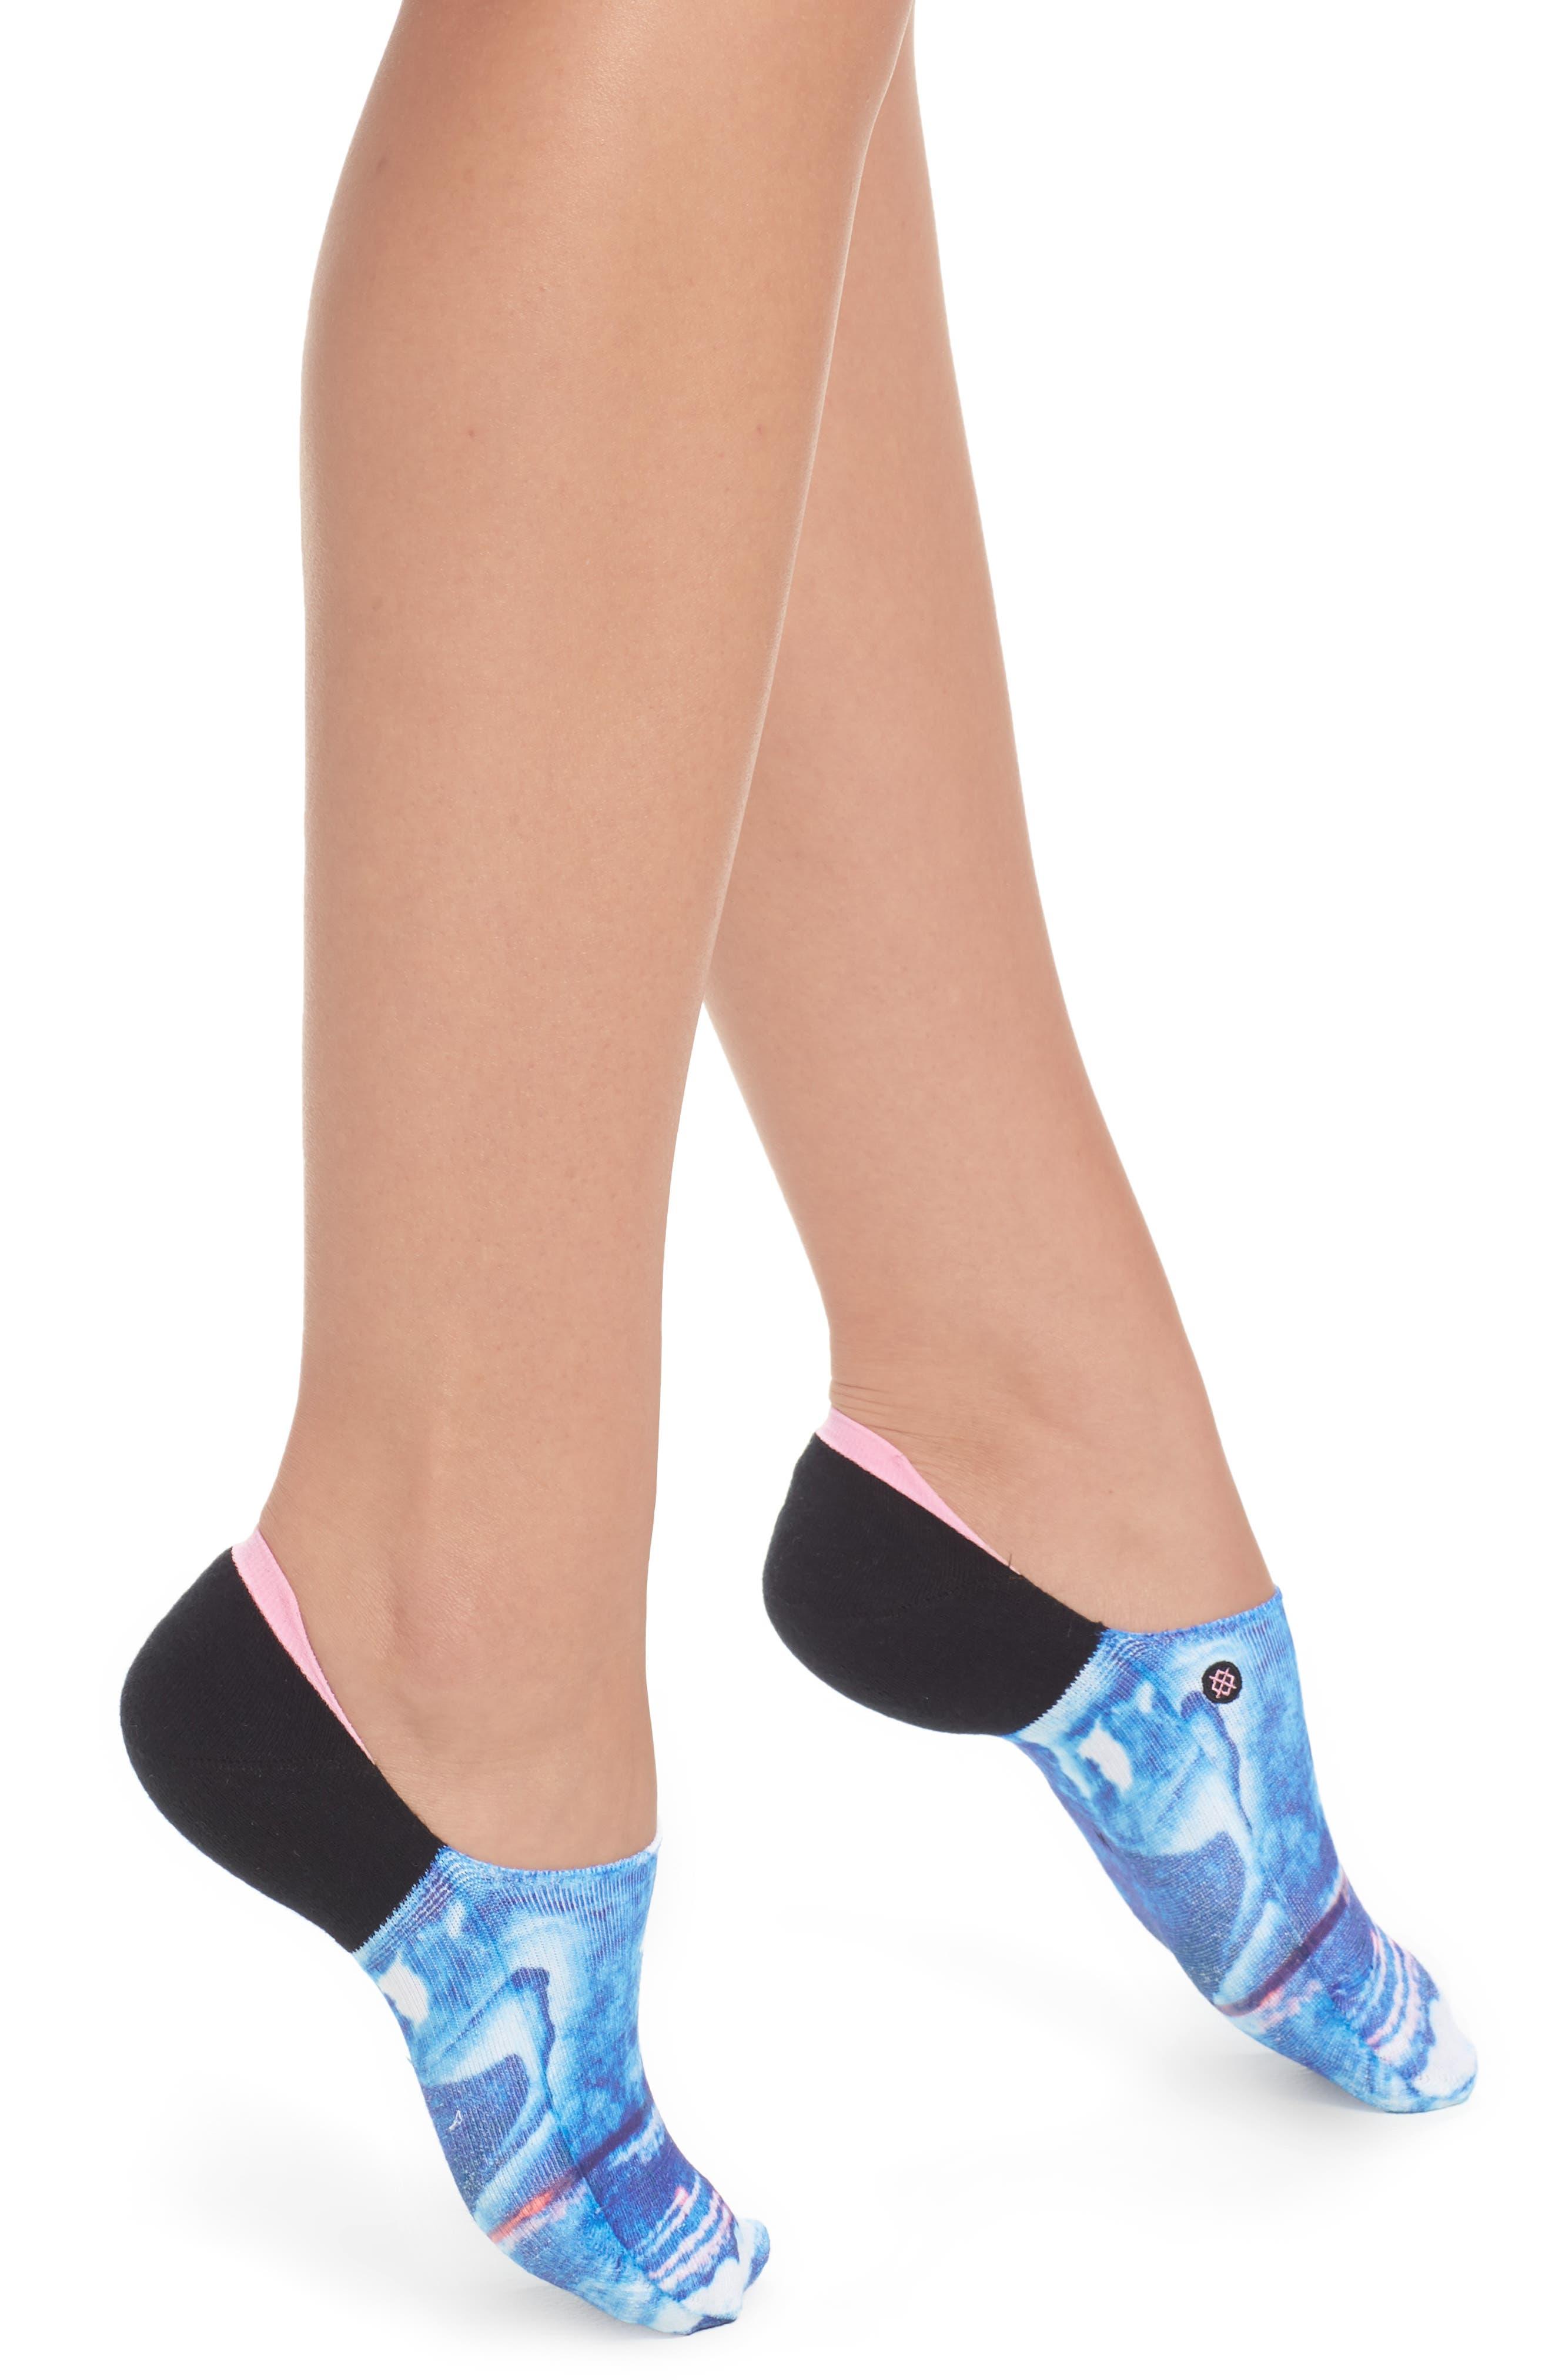 Tropic Storm No-Show Socks,                         Main,                         color, Blue